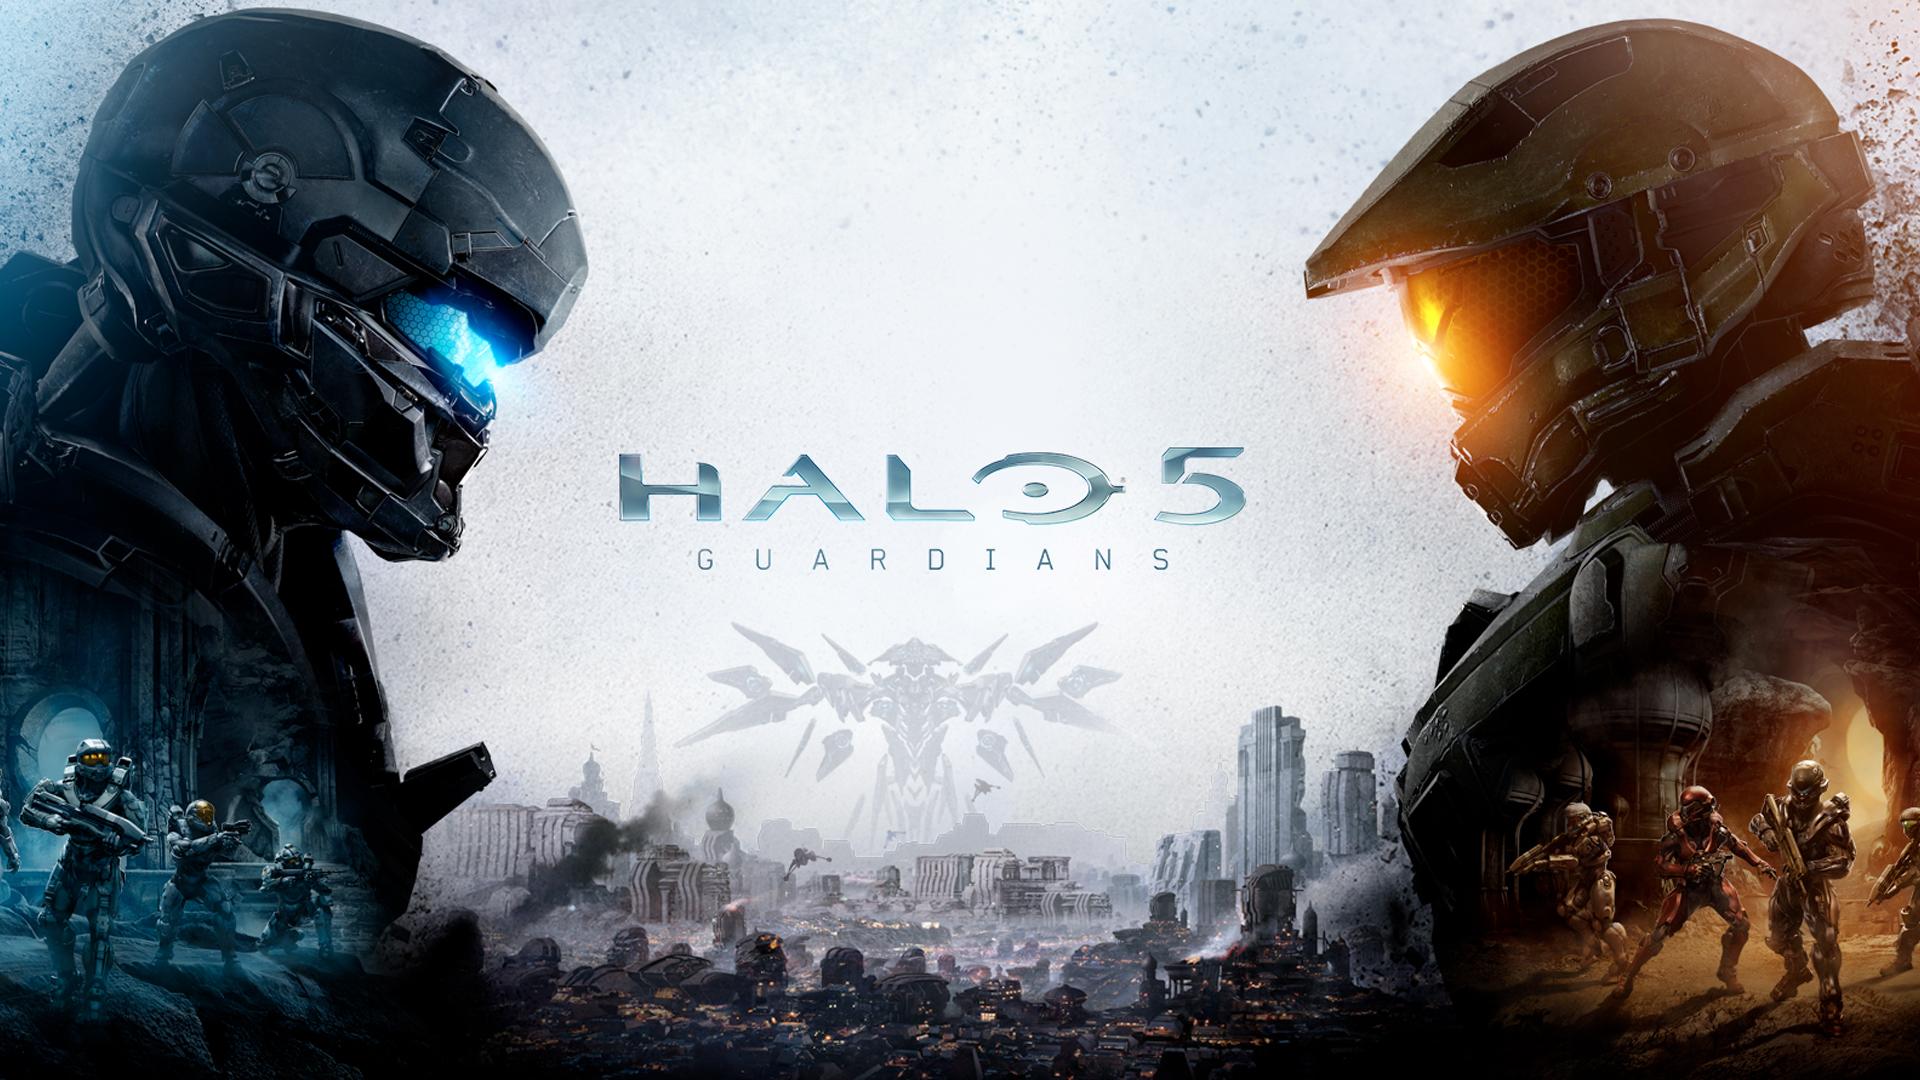 Halo 5 - Guardians - Wallpaper Full HD - 1980x1080